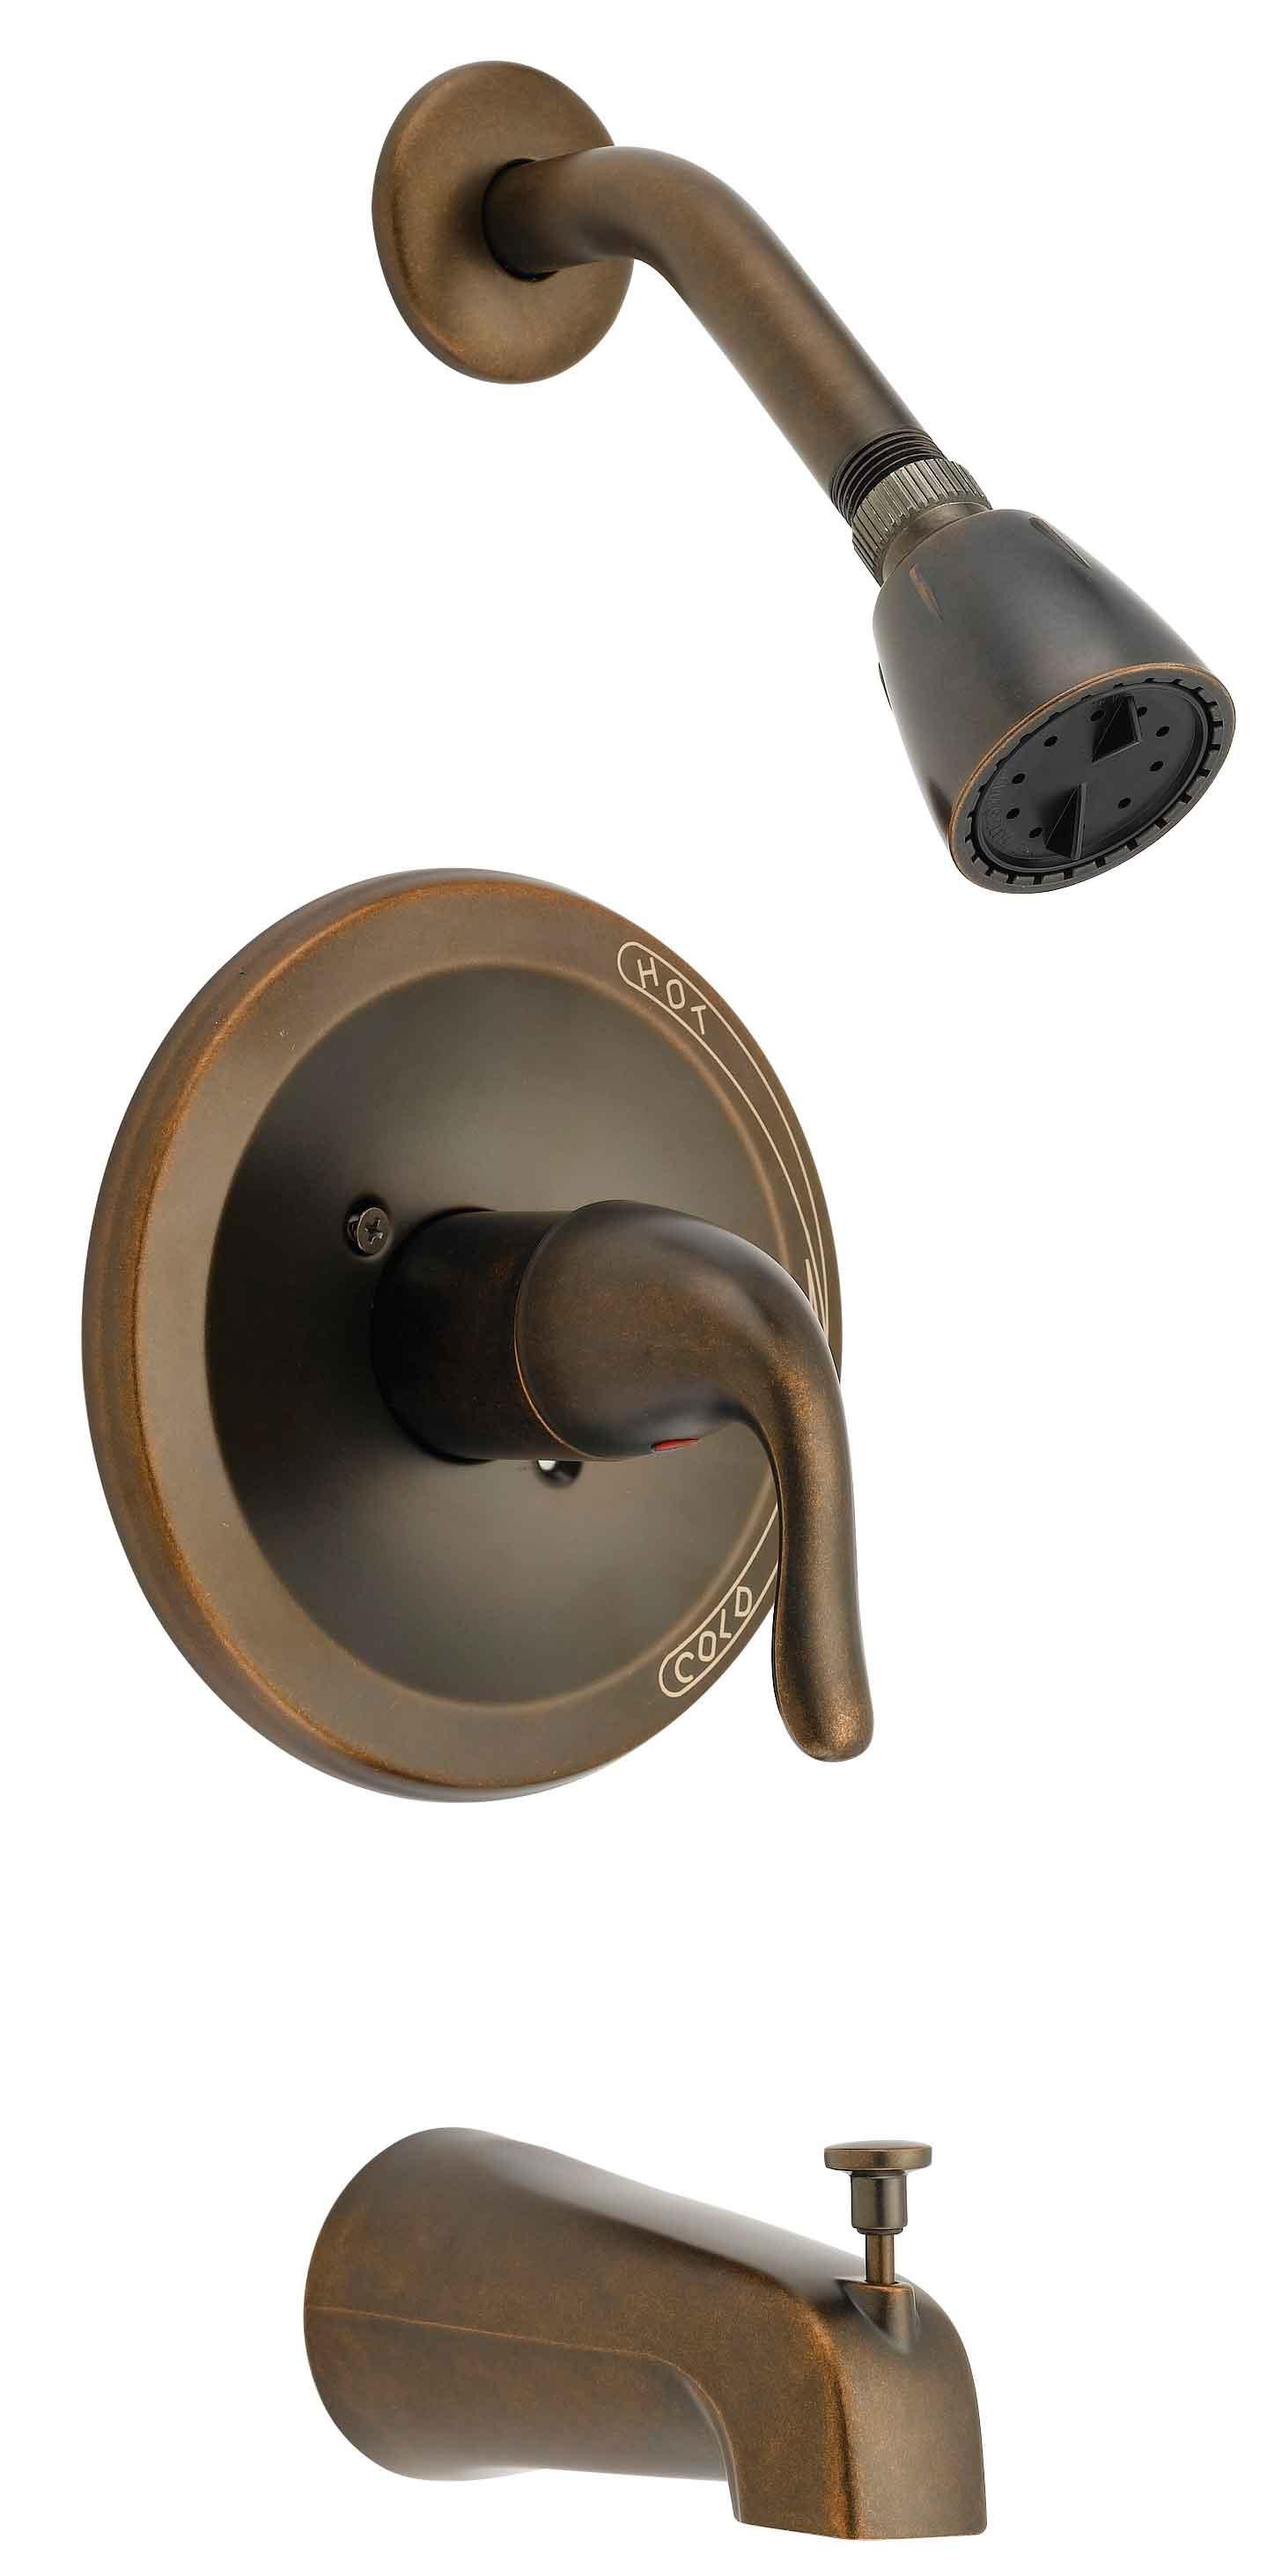 Plumbing Faucets Bath Faucets Tub & Shower Matco-Norca   Murray ...